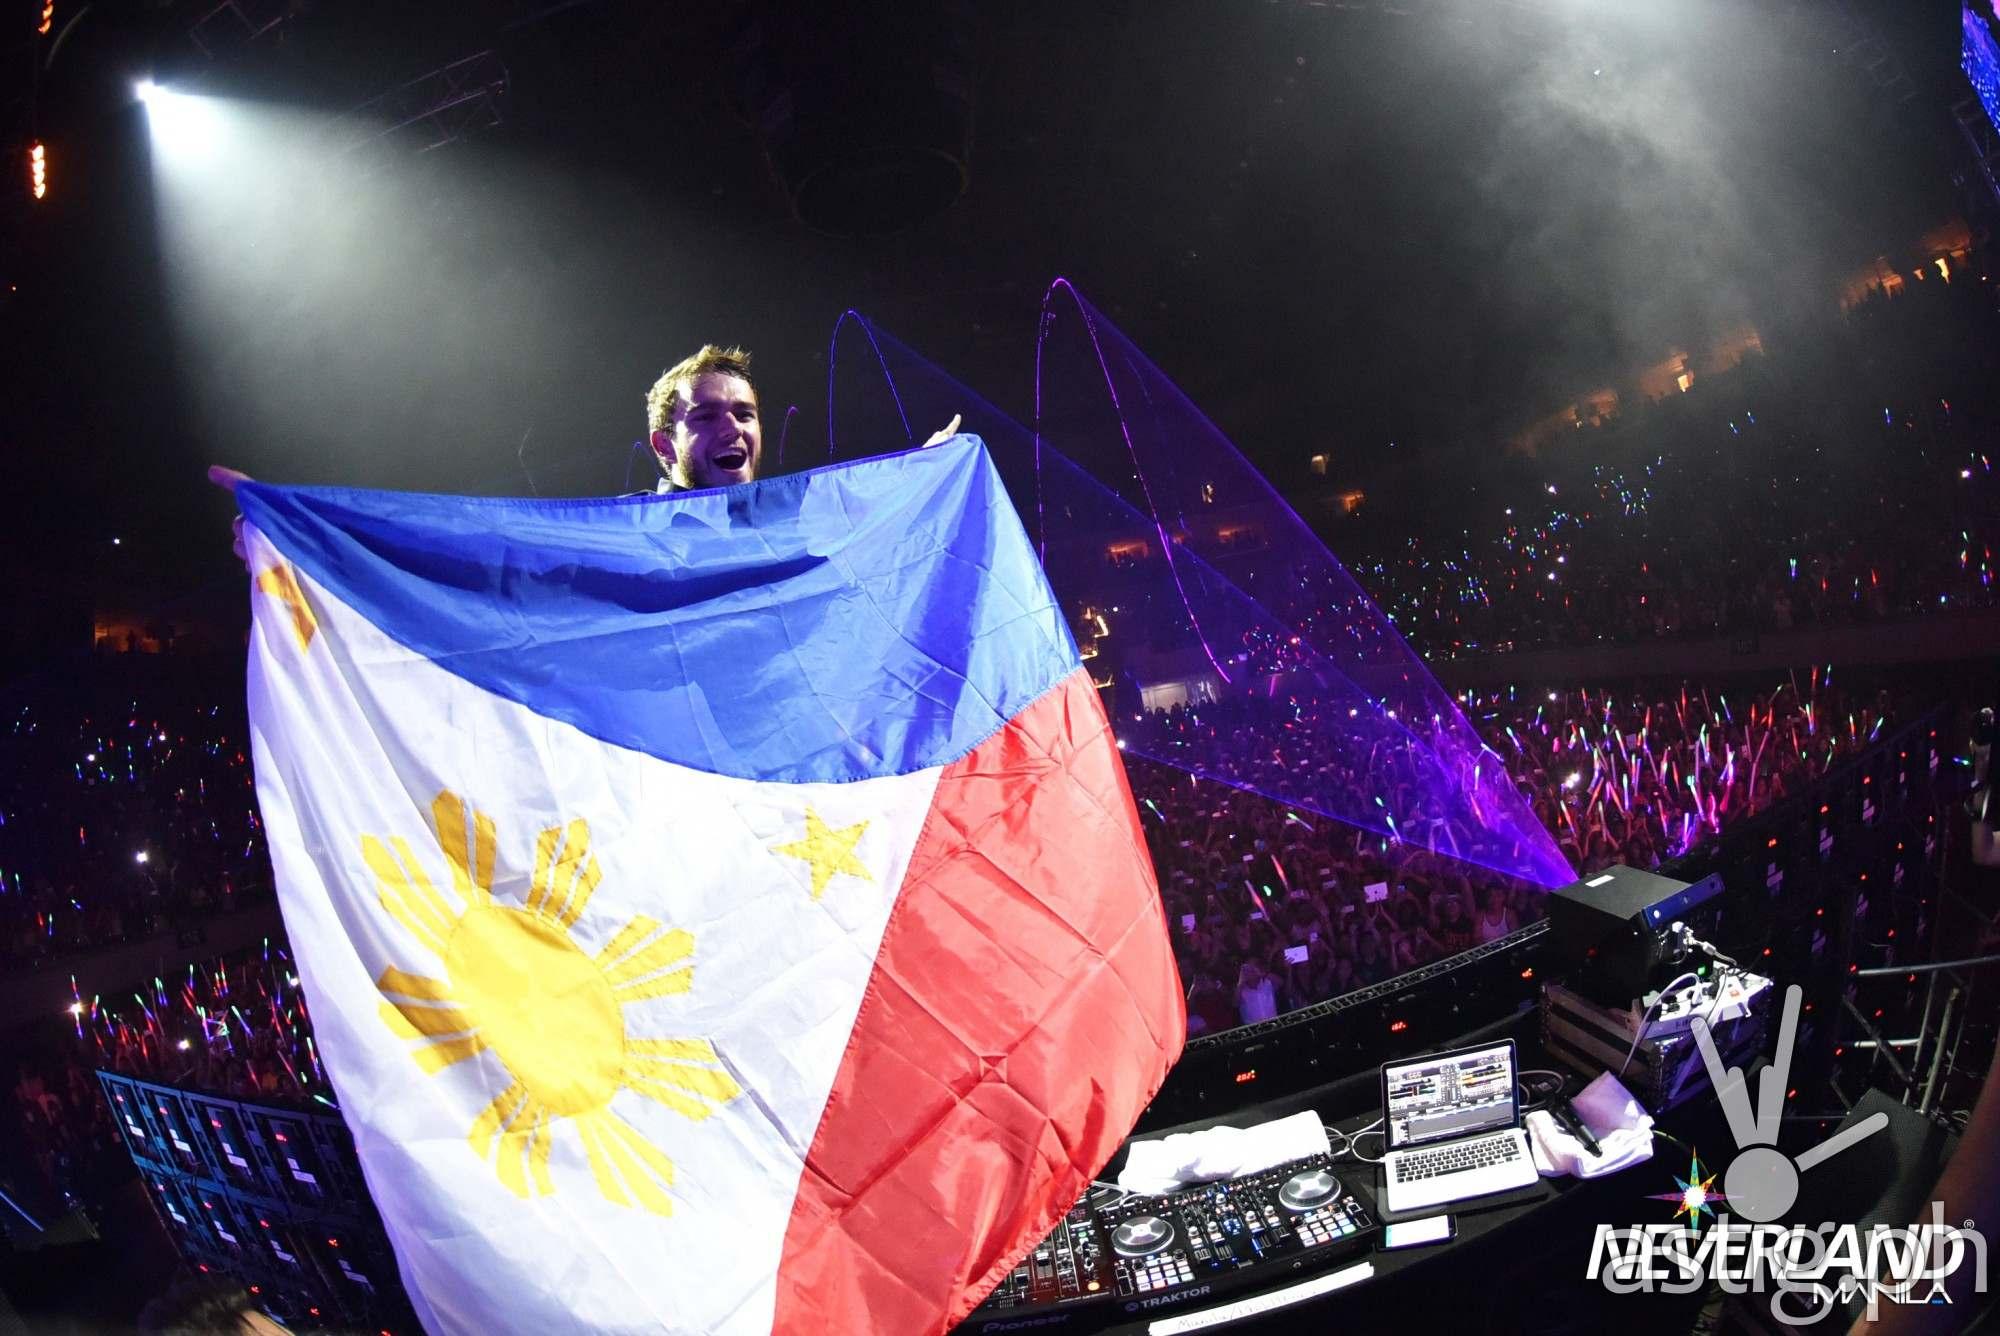 Neverland Manila Presents: Zedd True Colors (photo: Daniel Tan Photography)